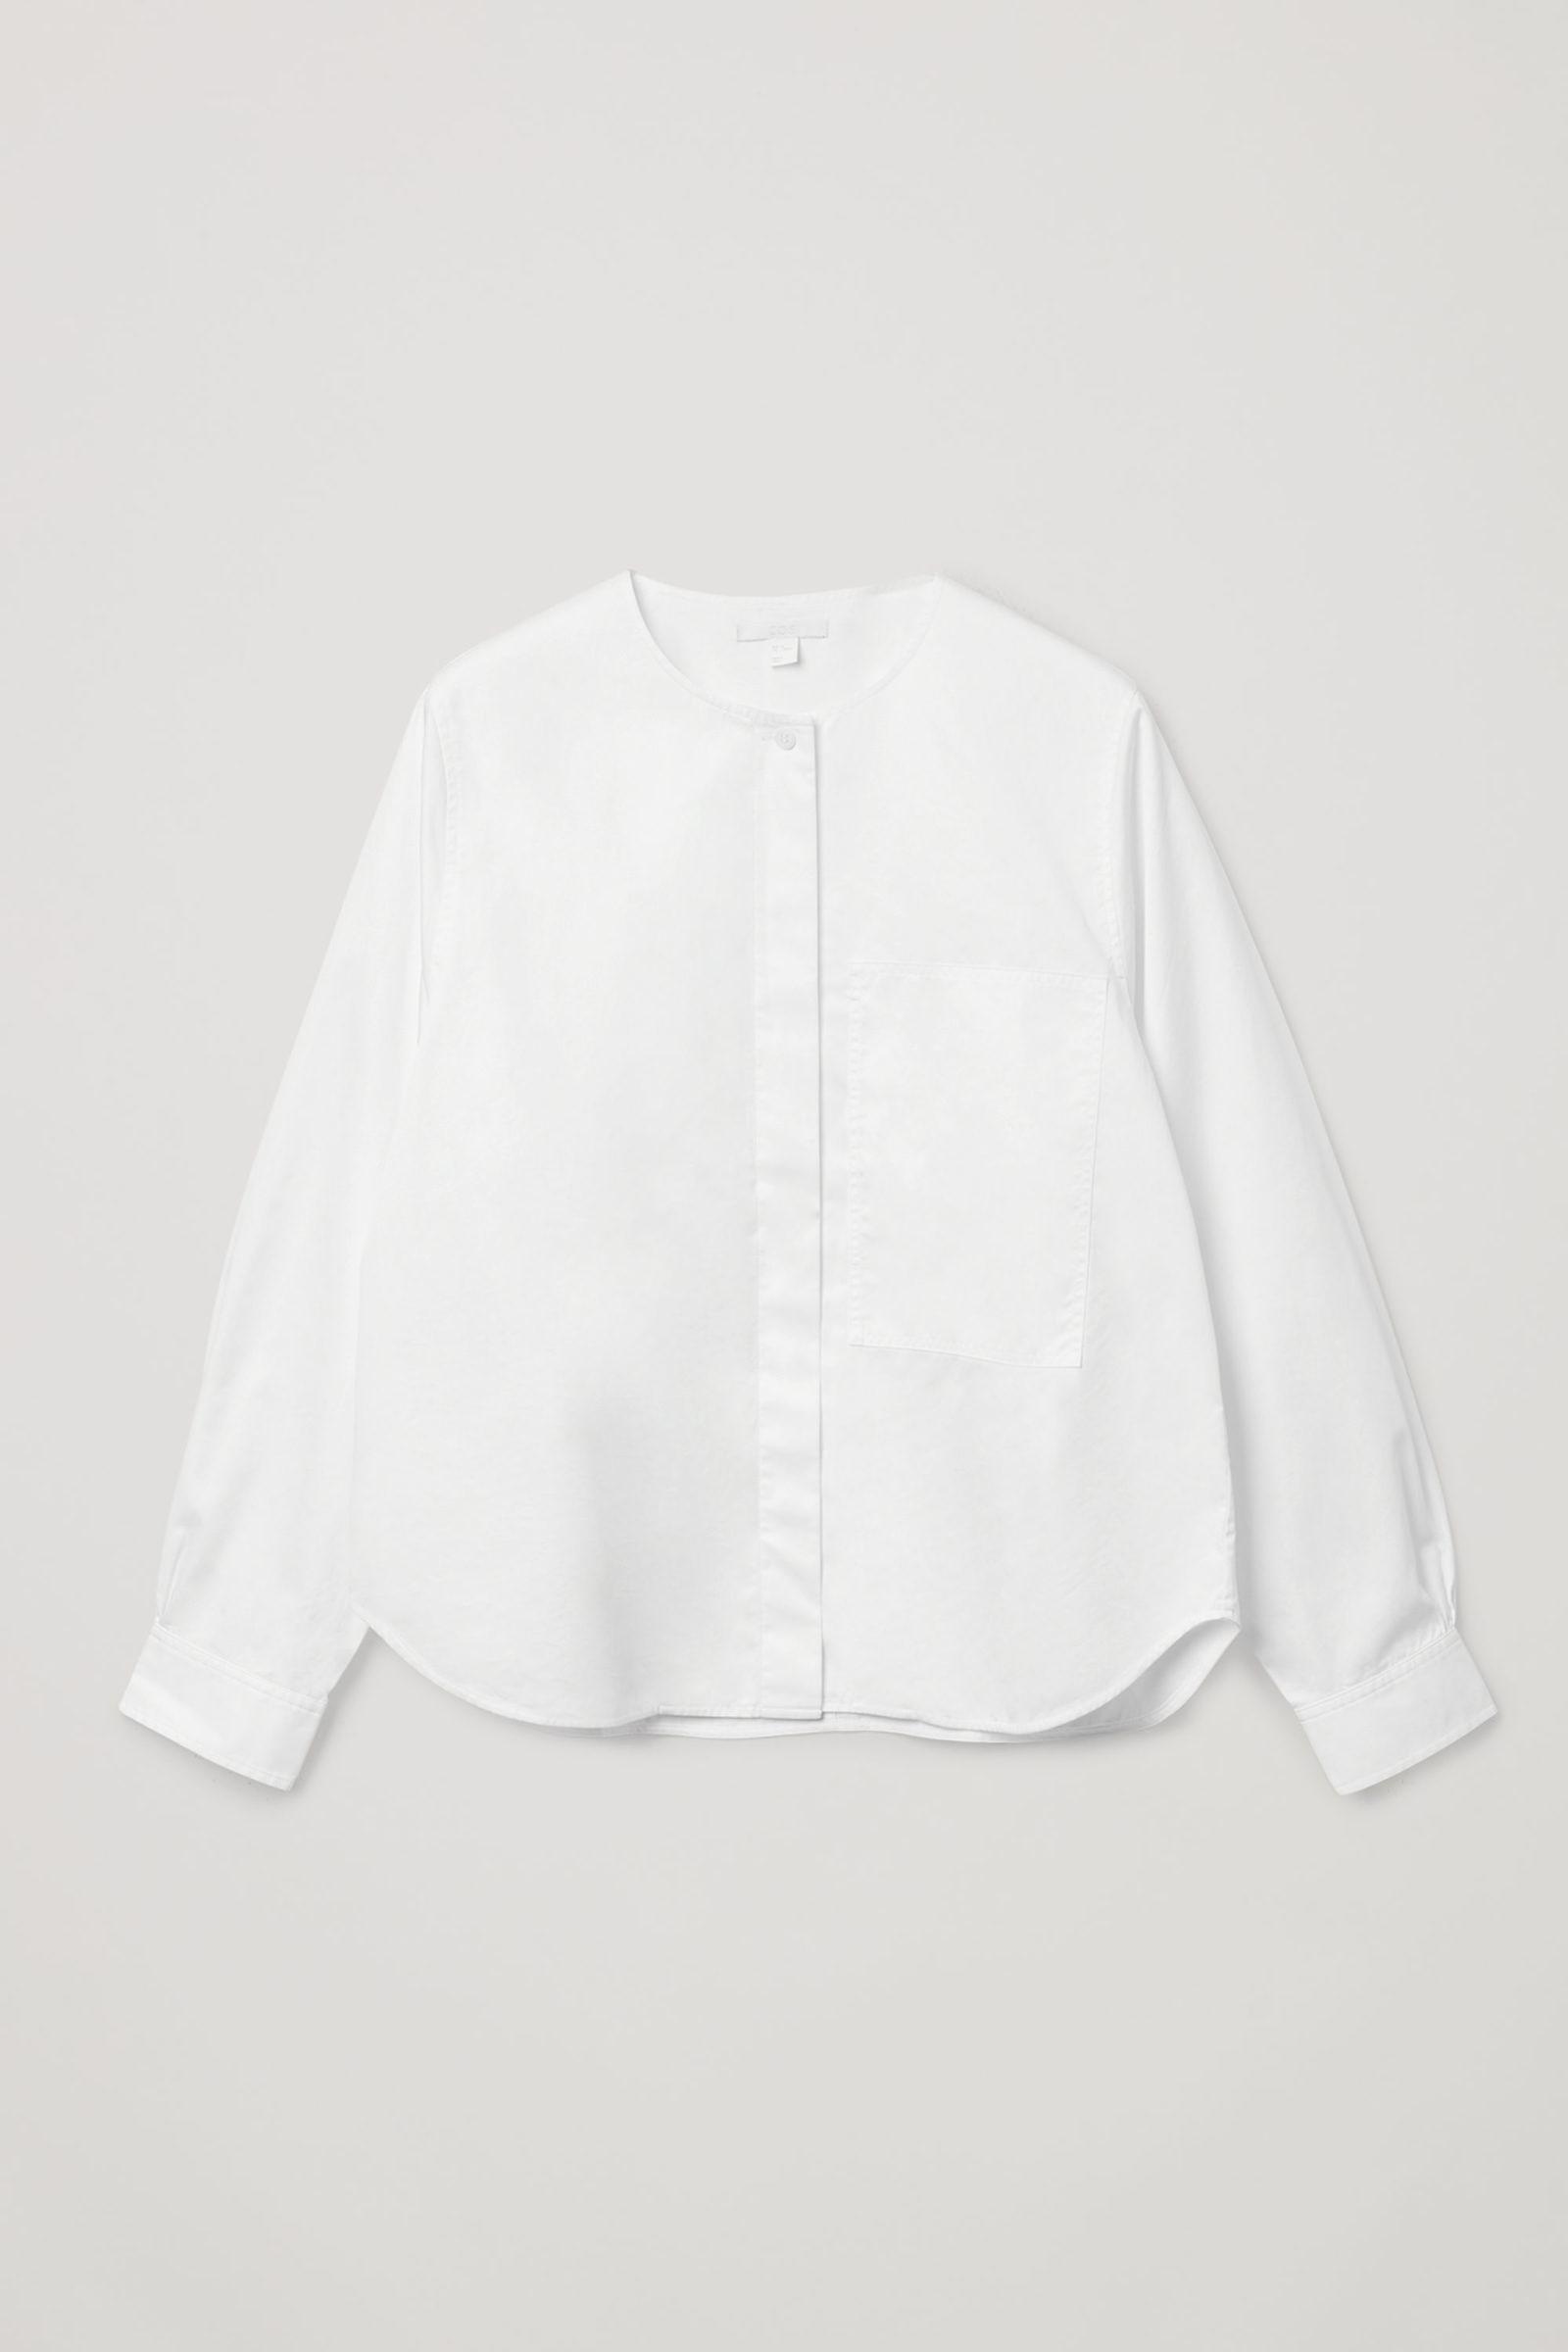 COS 오가닉 코튼 그랜대드 칼라 패치 포켓 셔츠의 화이트컬러 Product입니다.